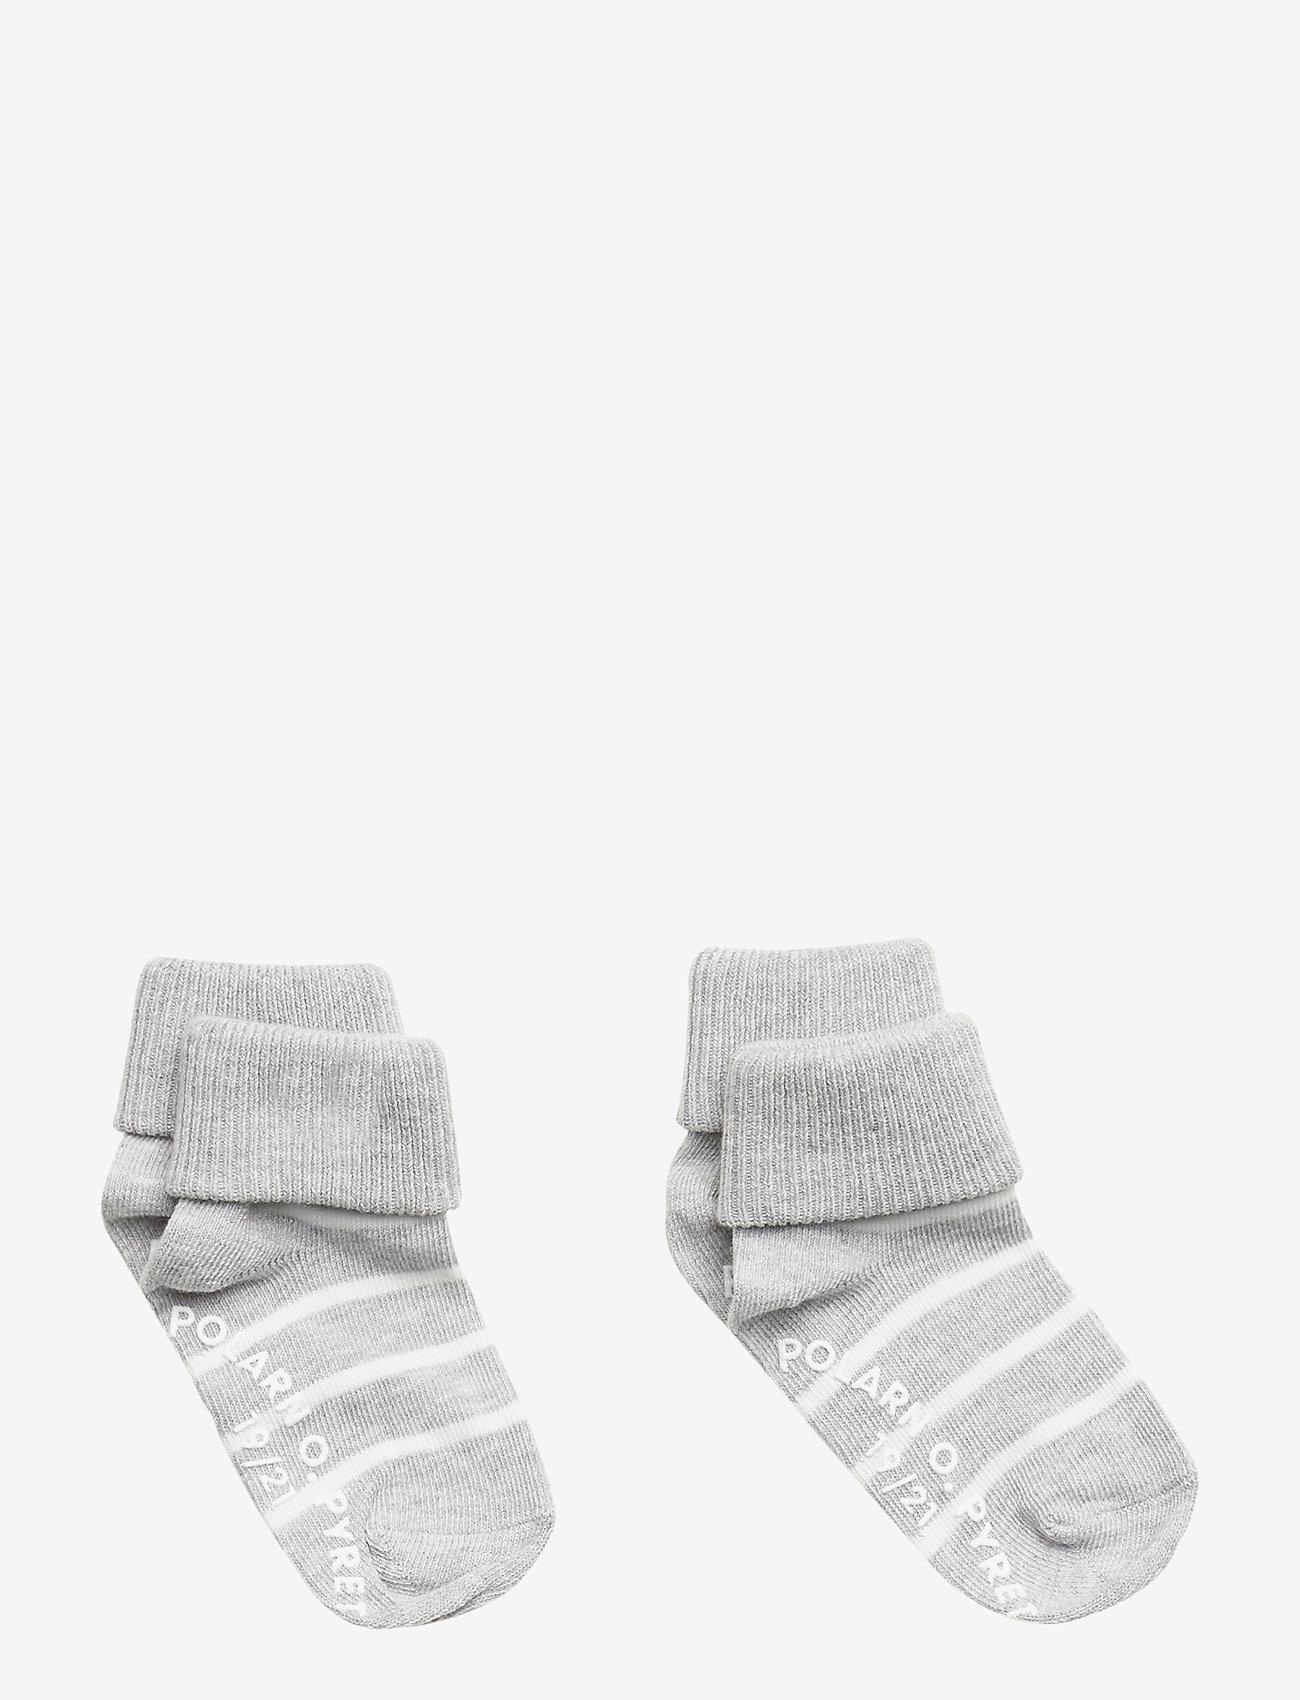 Polarn O. Pyret - Socks 2-P Turn-up Anti Slip PO.P Stripe - greymelange - 0